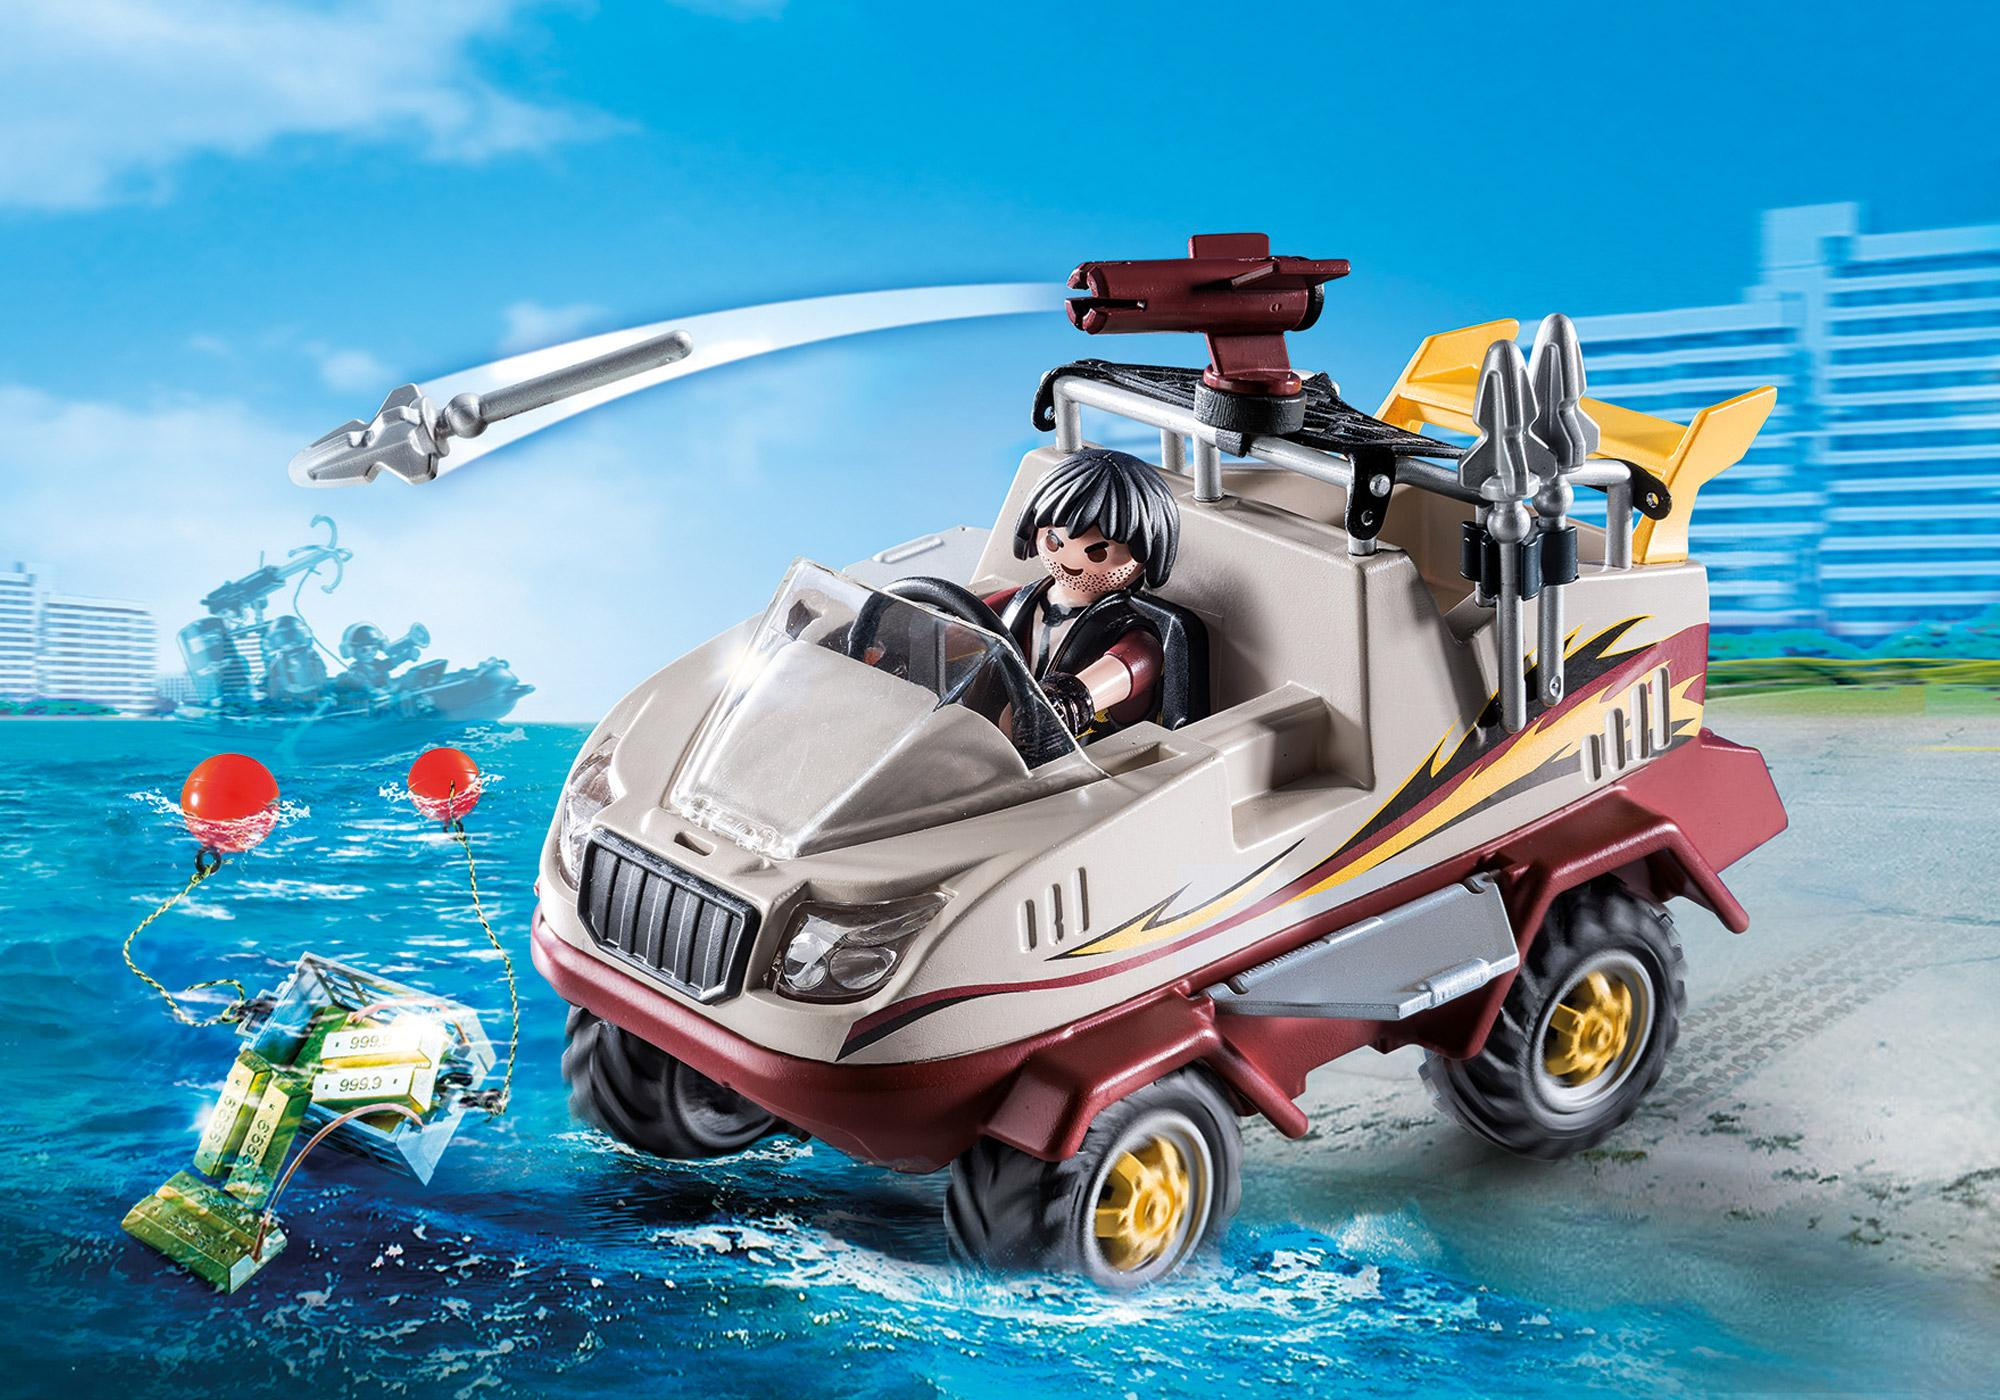 http://media.playmobil.com/i/playmobil/9364_product_detail/Αμφίβιο όχημα Ομάδας Ειδικών Αποστολών